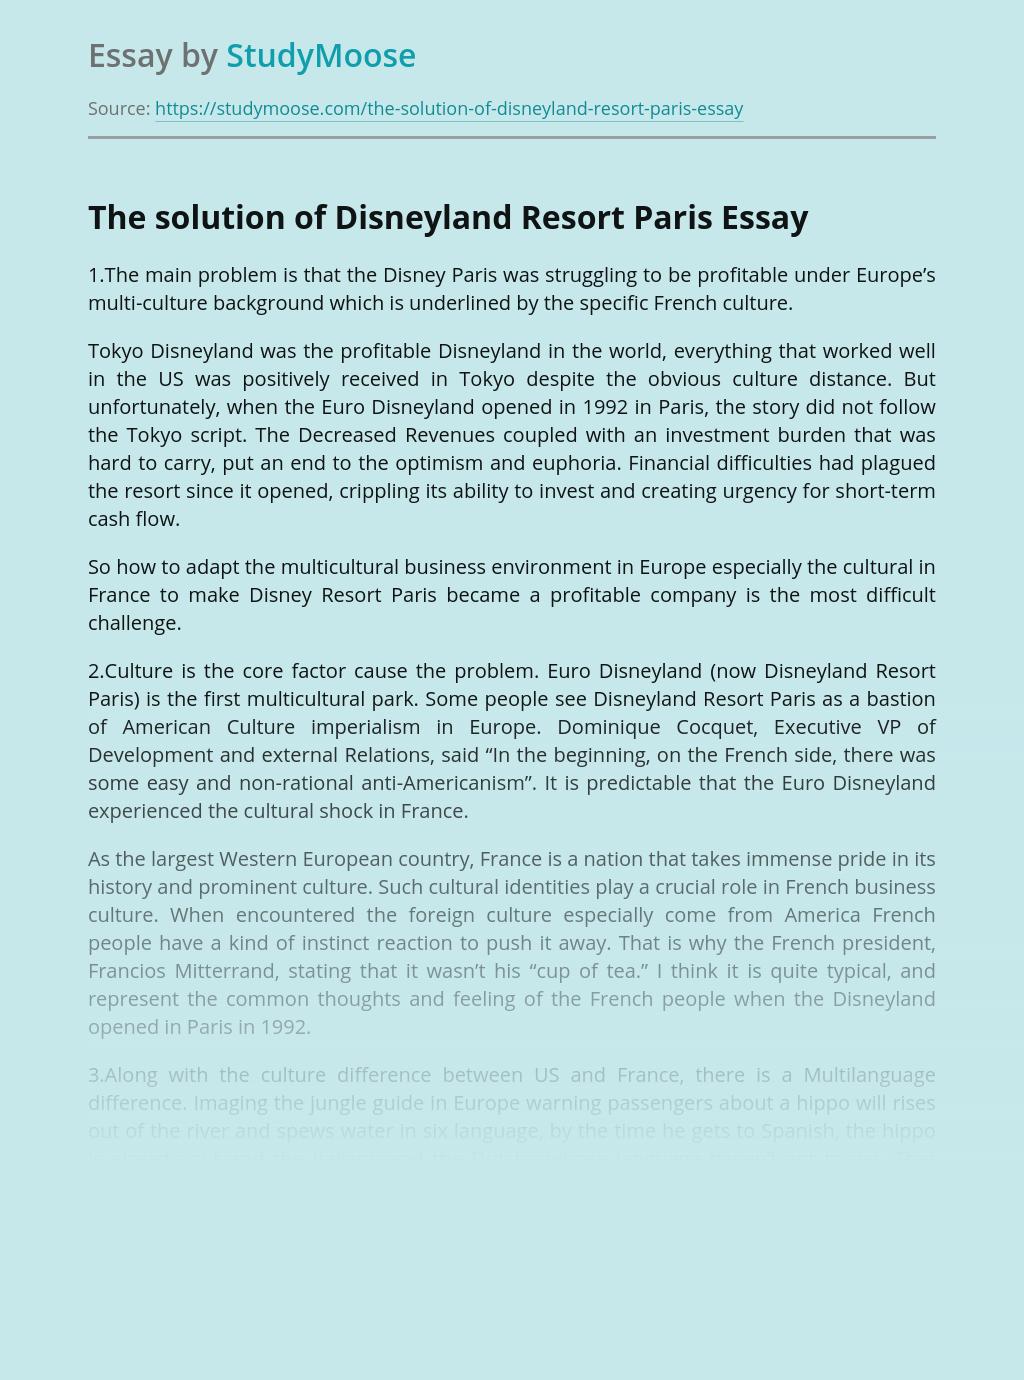 The solution of Disneyland Resort Paris